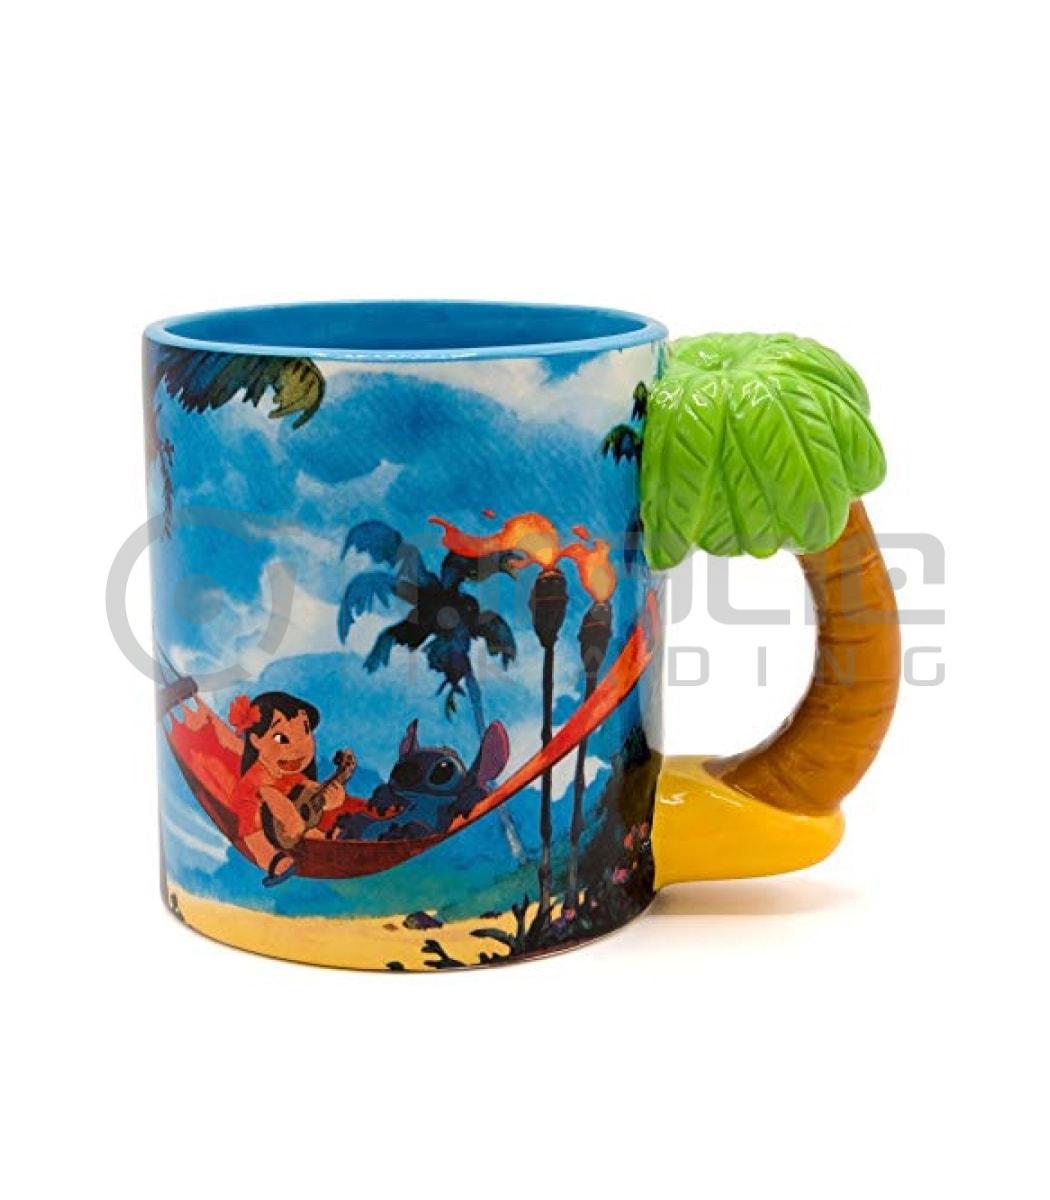 Lilo & Stitch Sculpted Mug - Tree